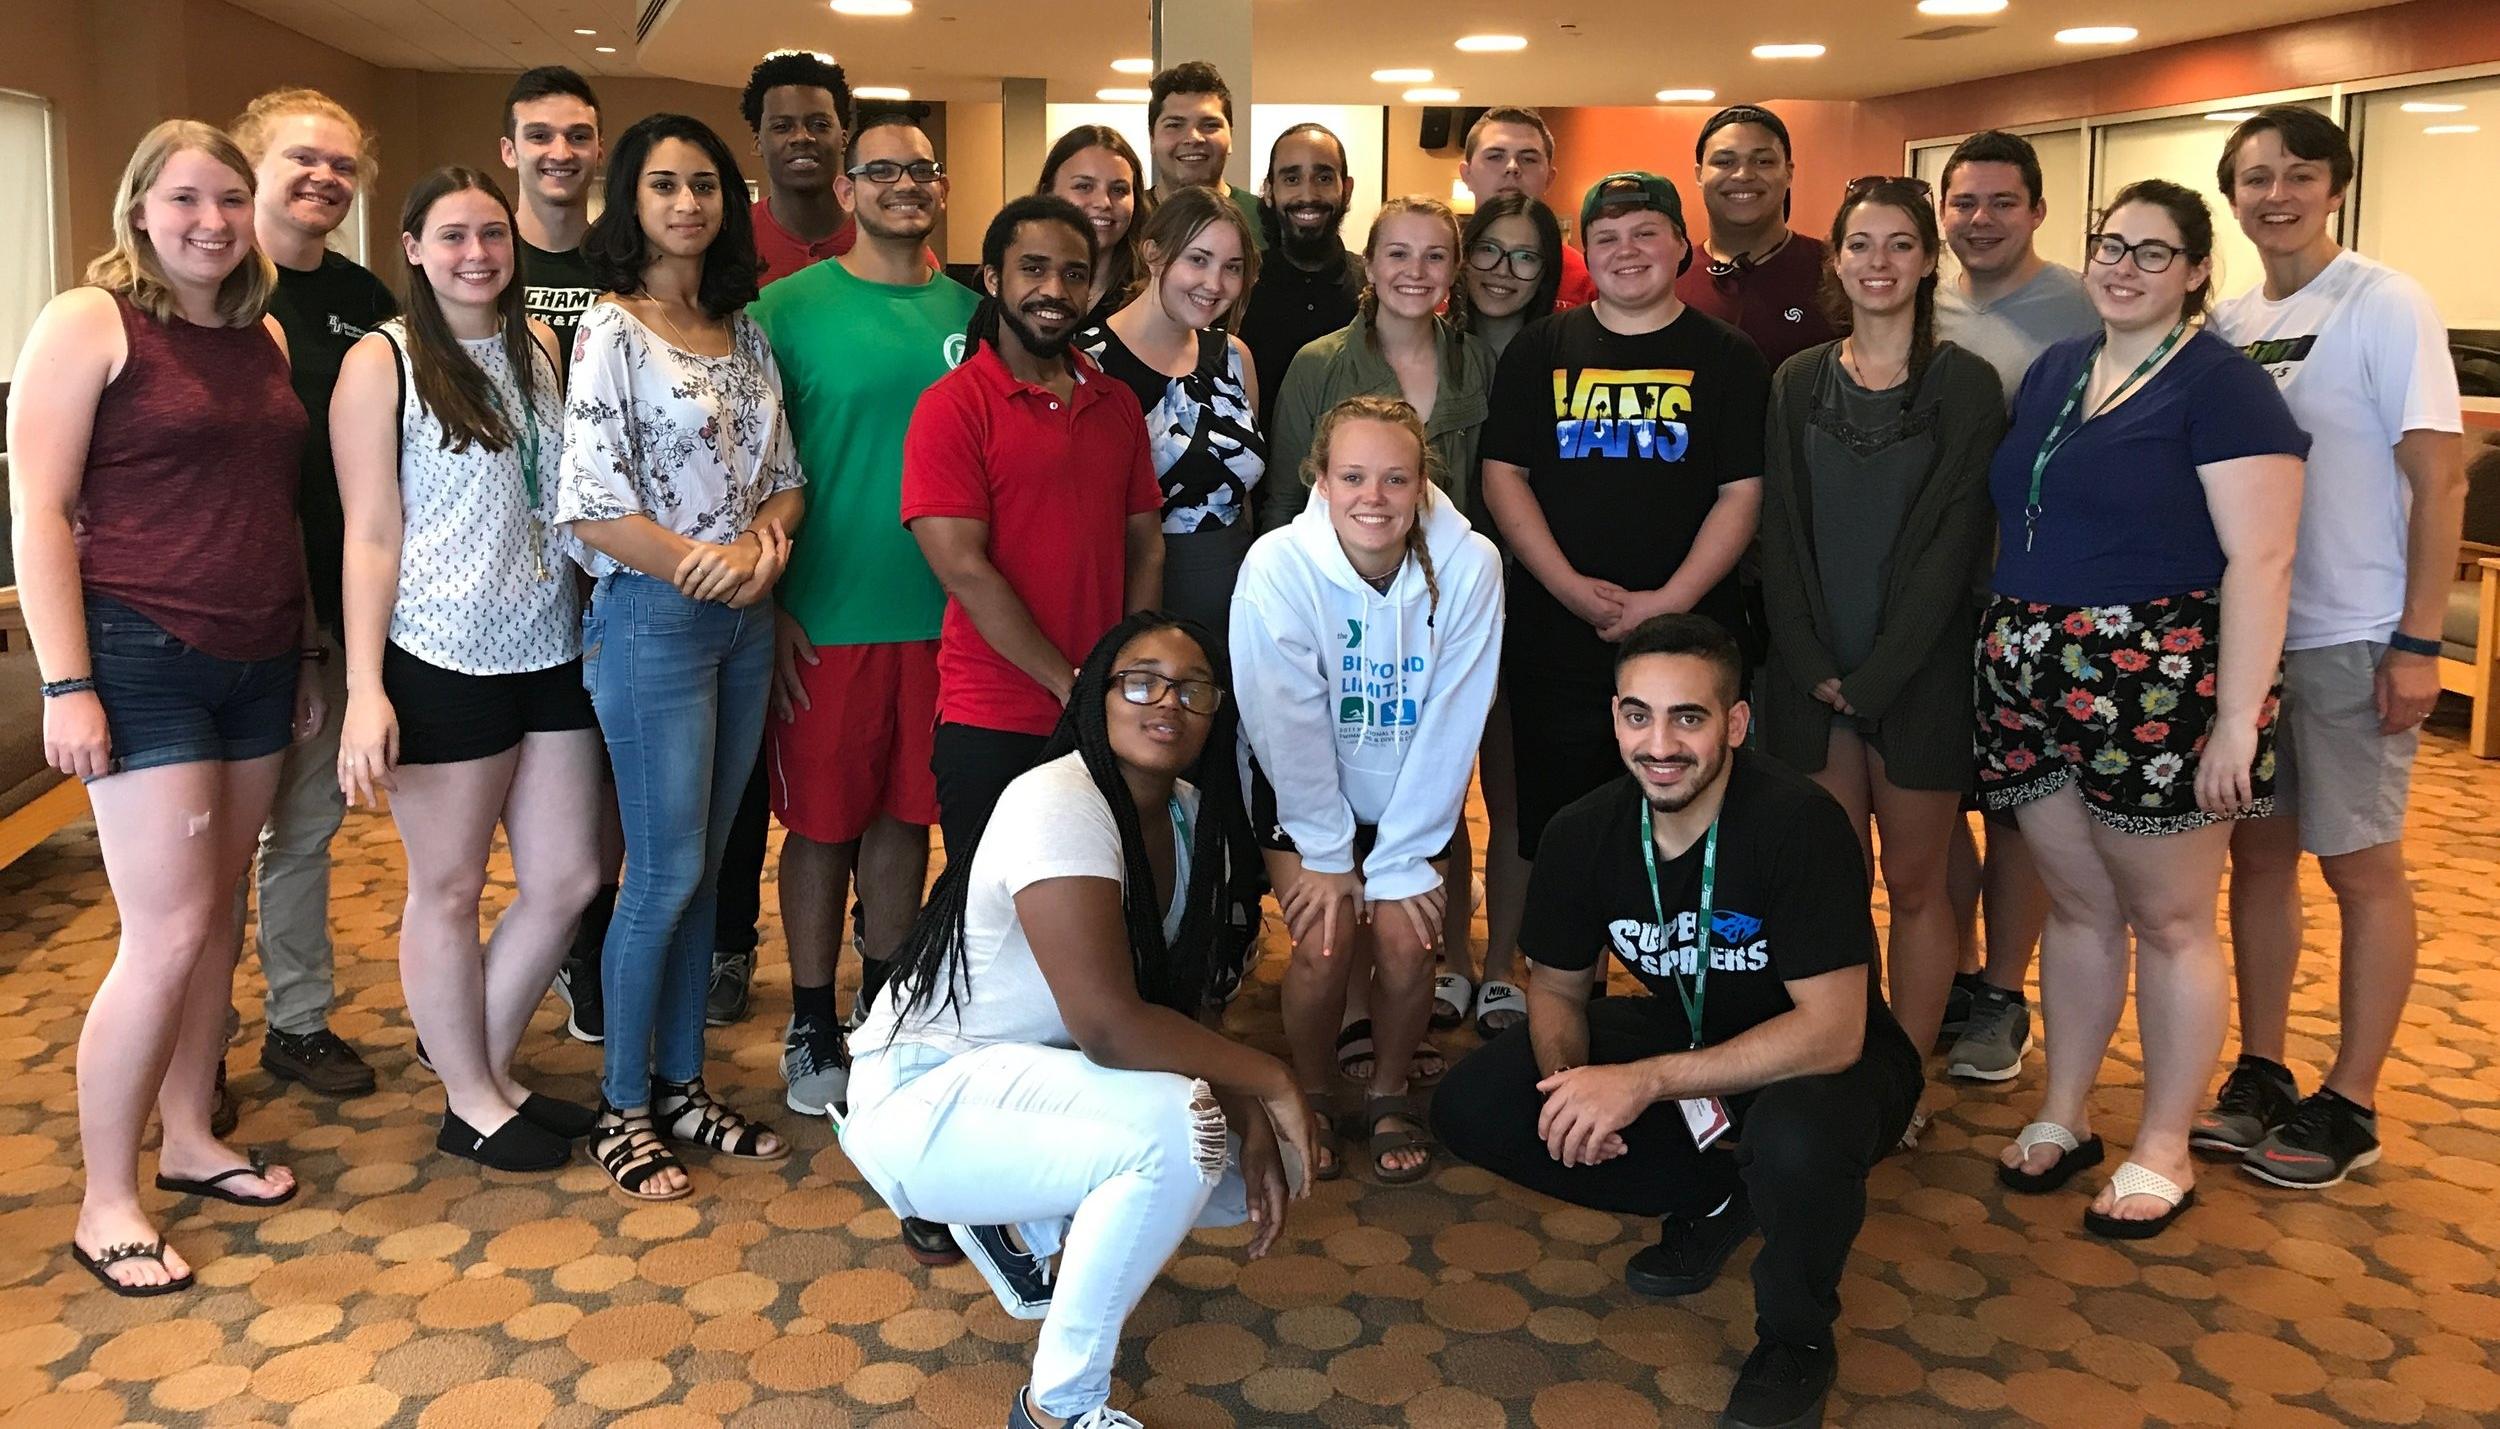 Mountainview Res Life Team at Binghamton